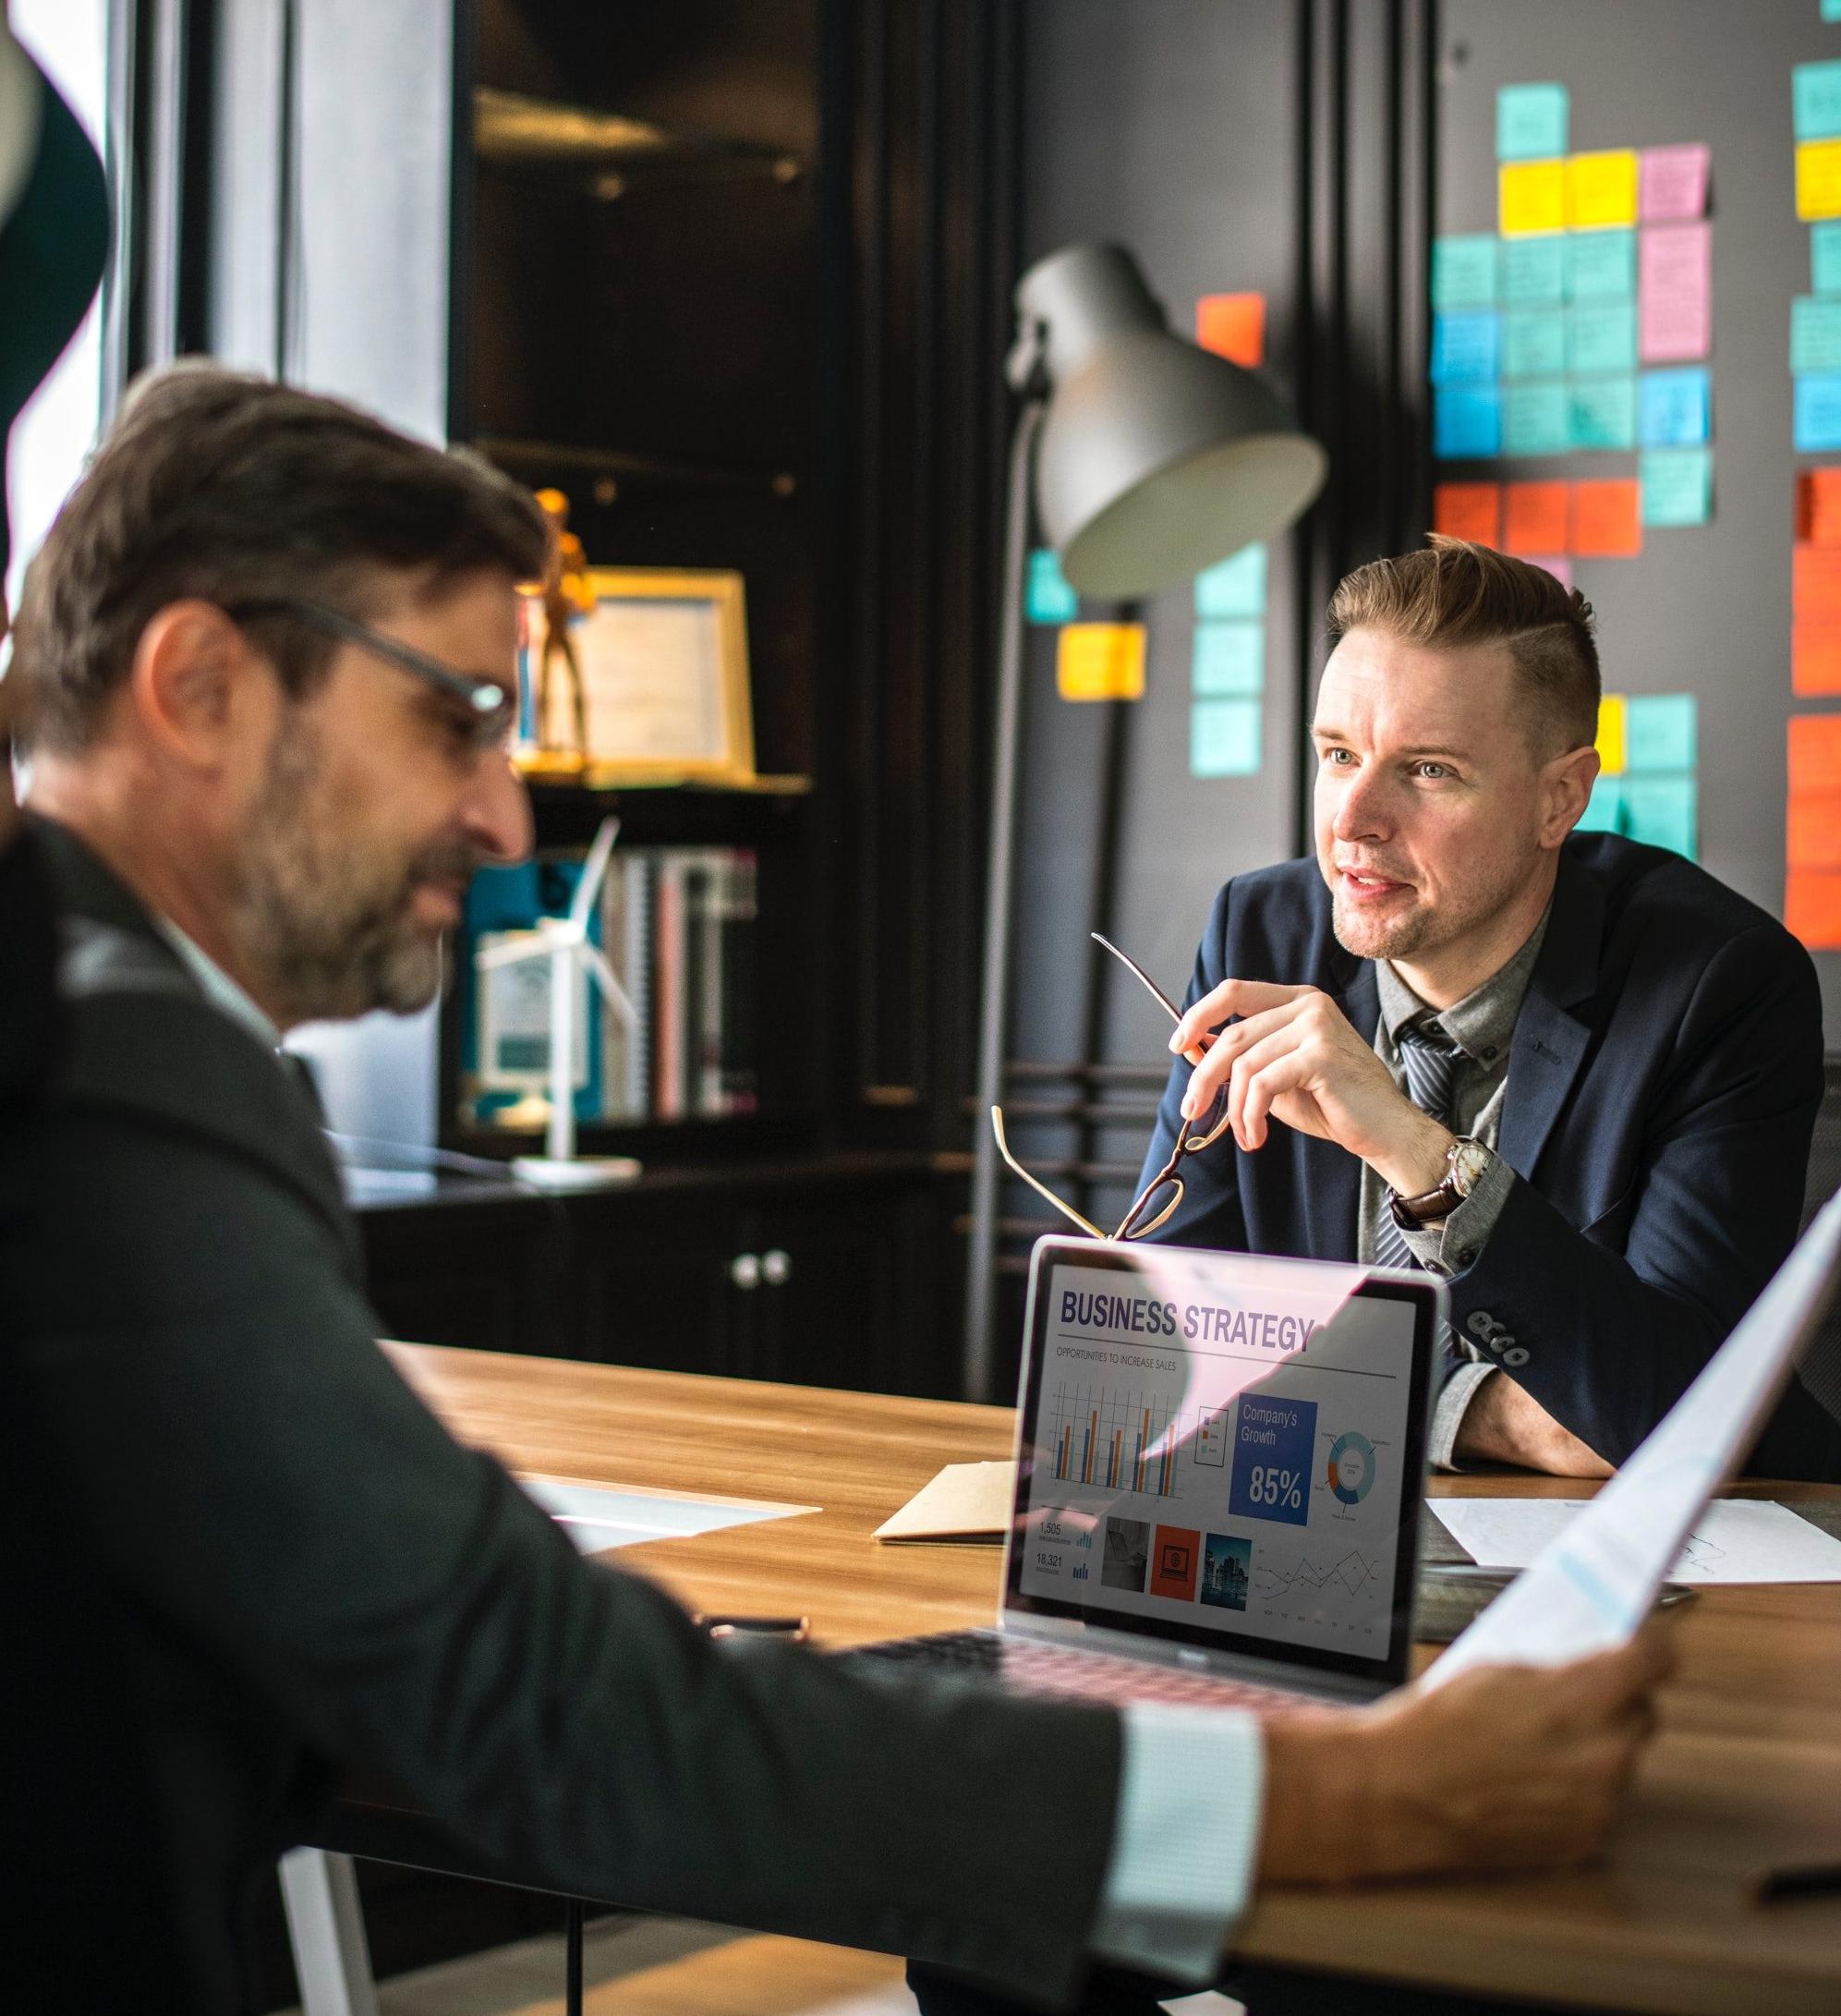 Analyzing-Brainstorming-Businessmen